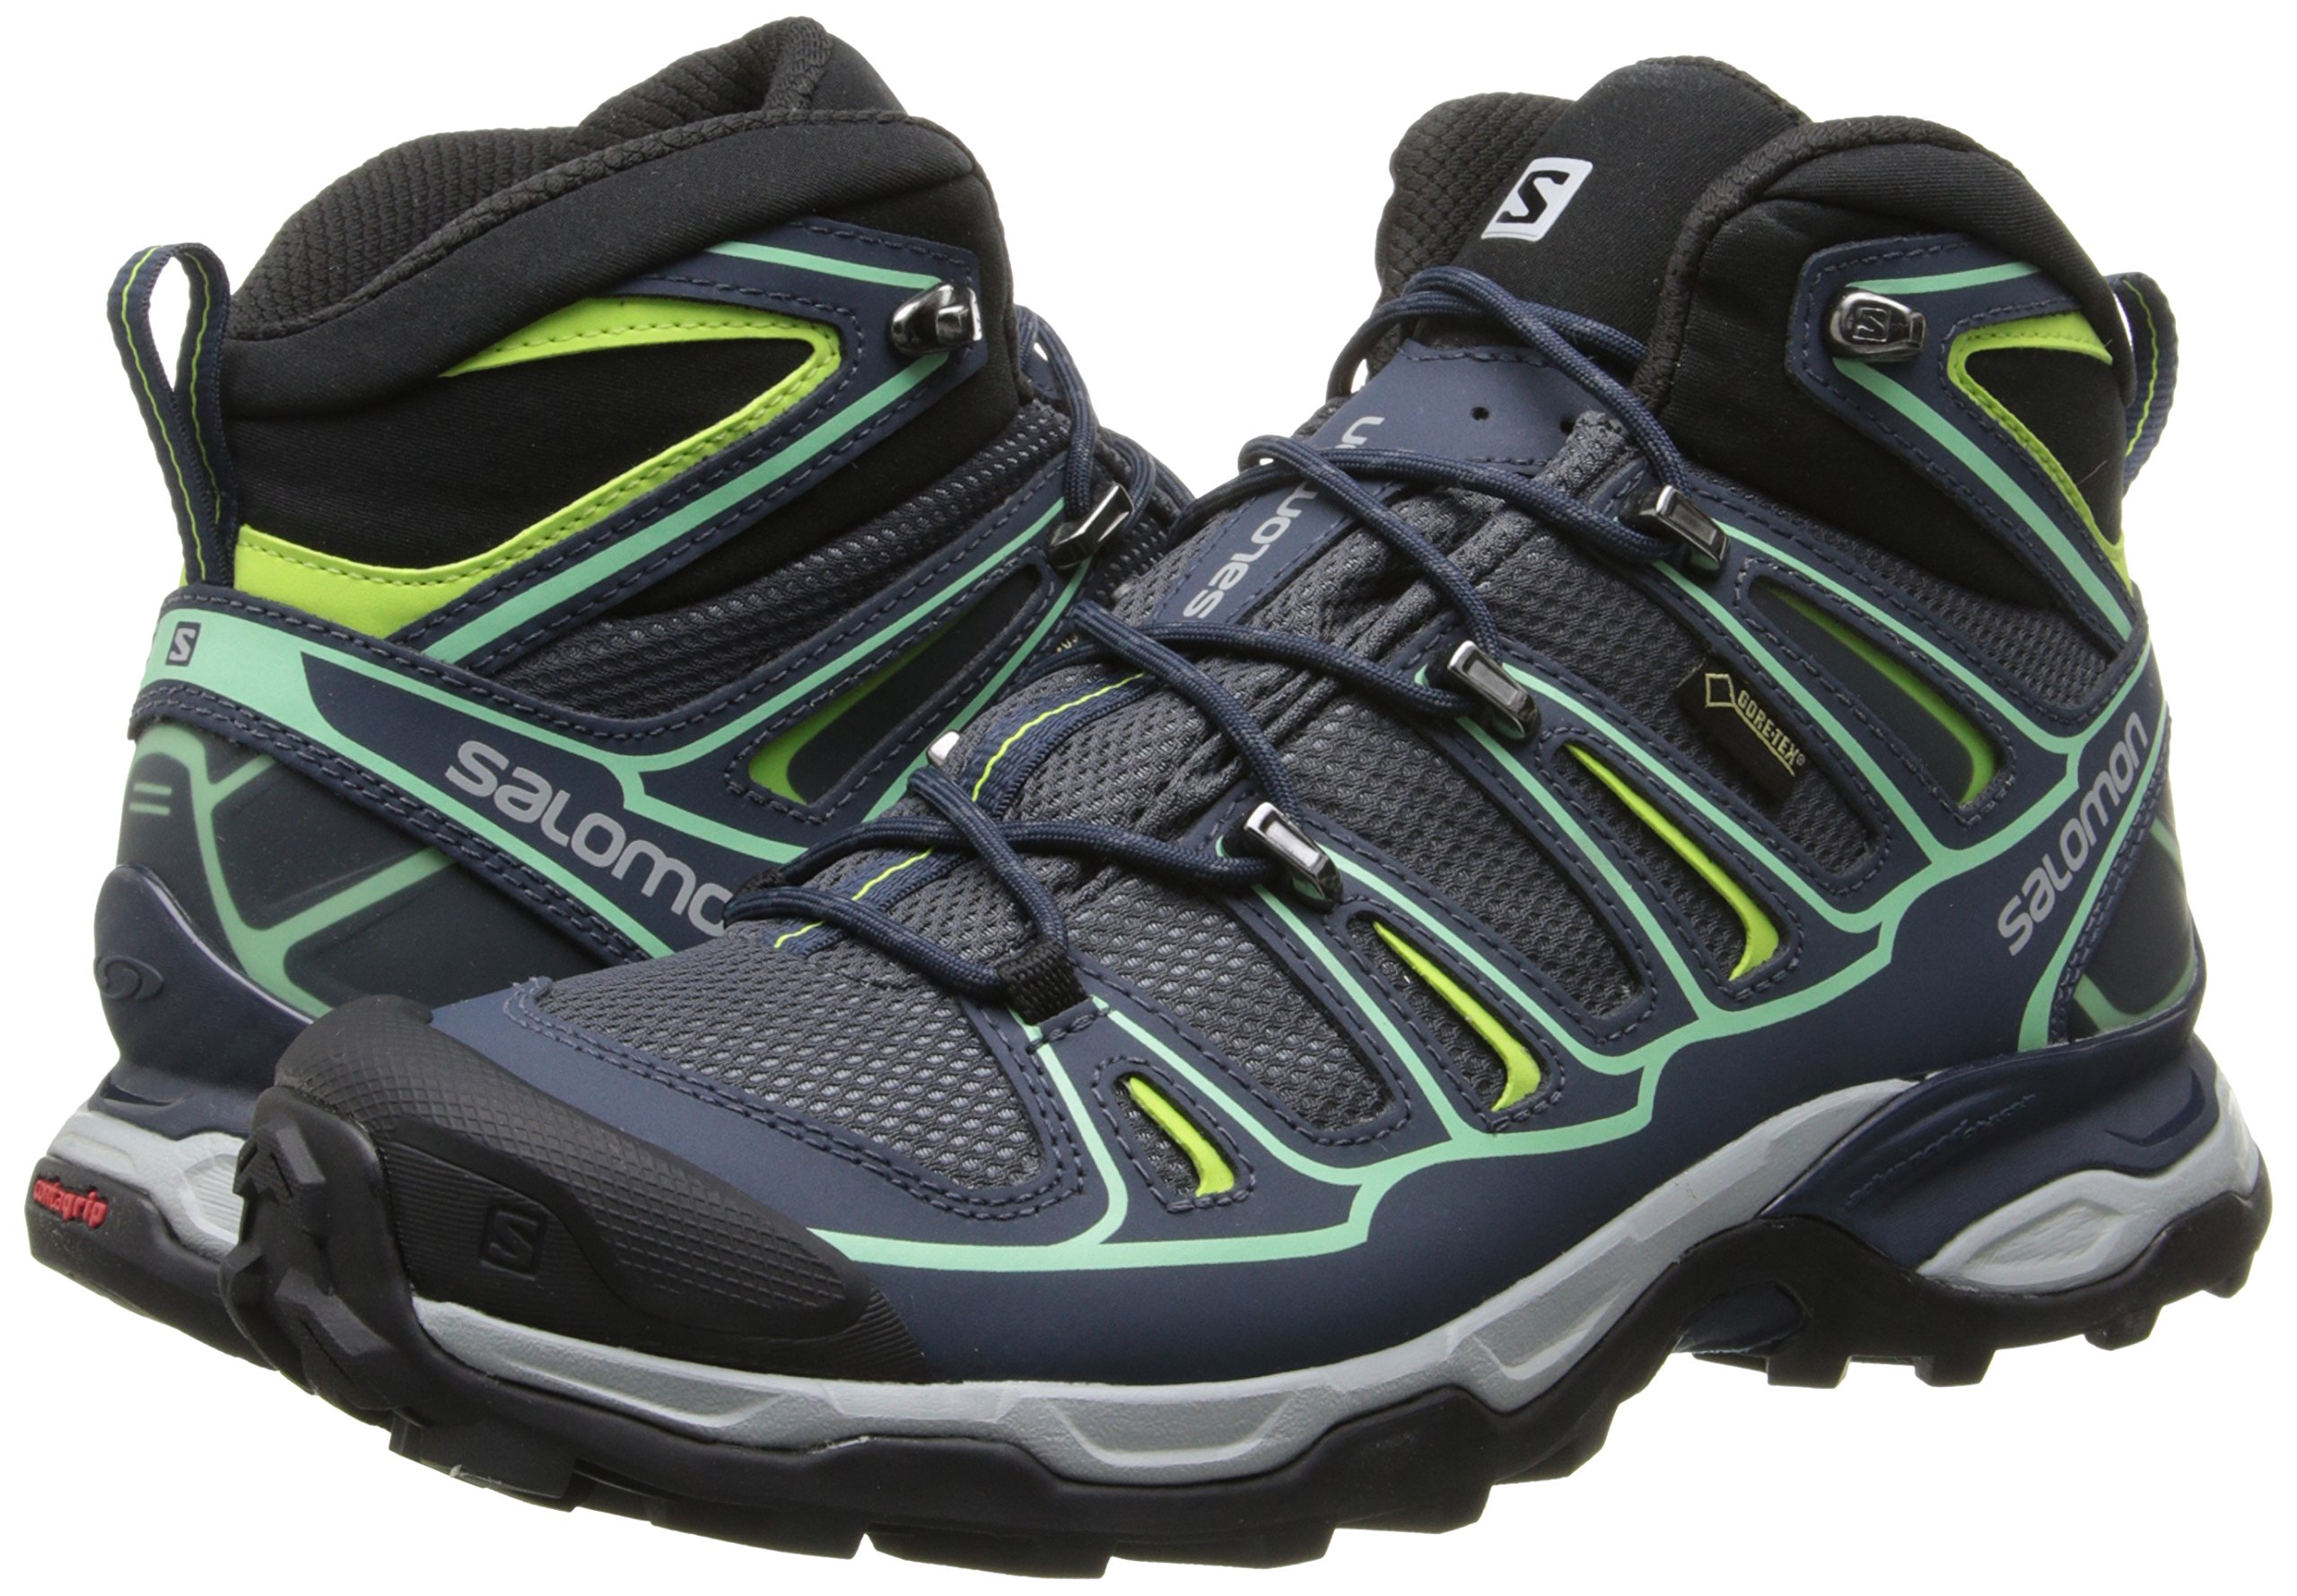 Salomon Women's X Ultra Mid 2 GTX Hiking Shoe, Grey Denim/Deep Blue/Lucite Green, 9 M US by Salomon (Image #6)